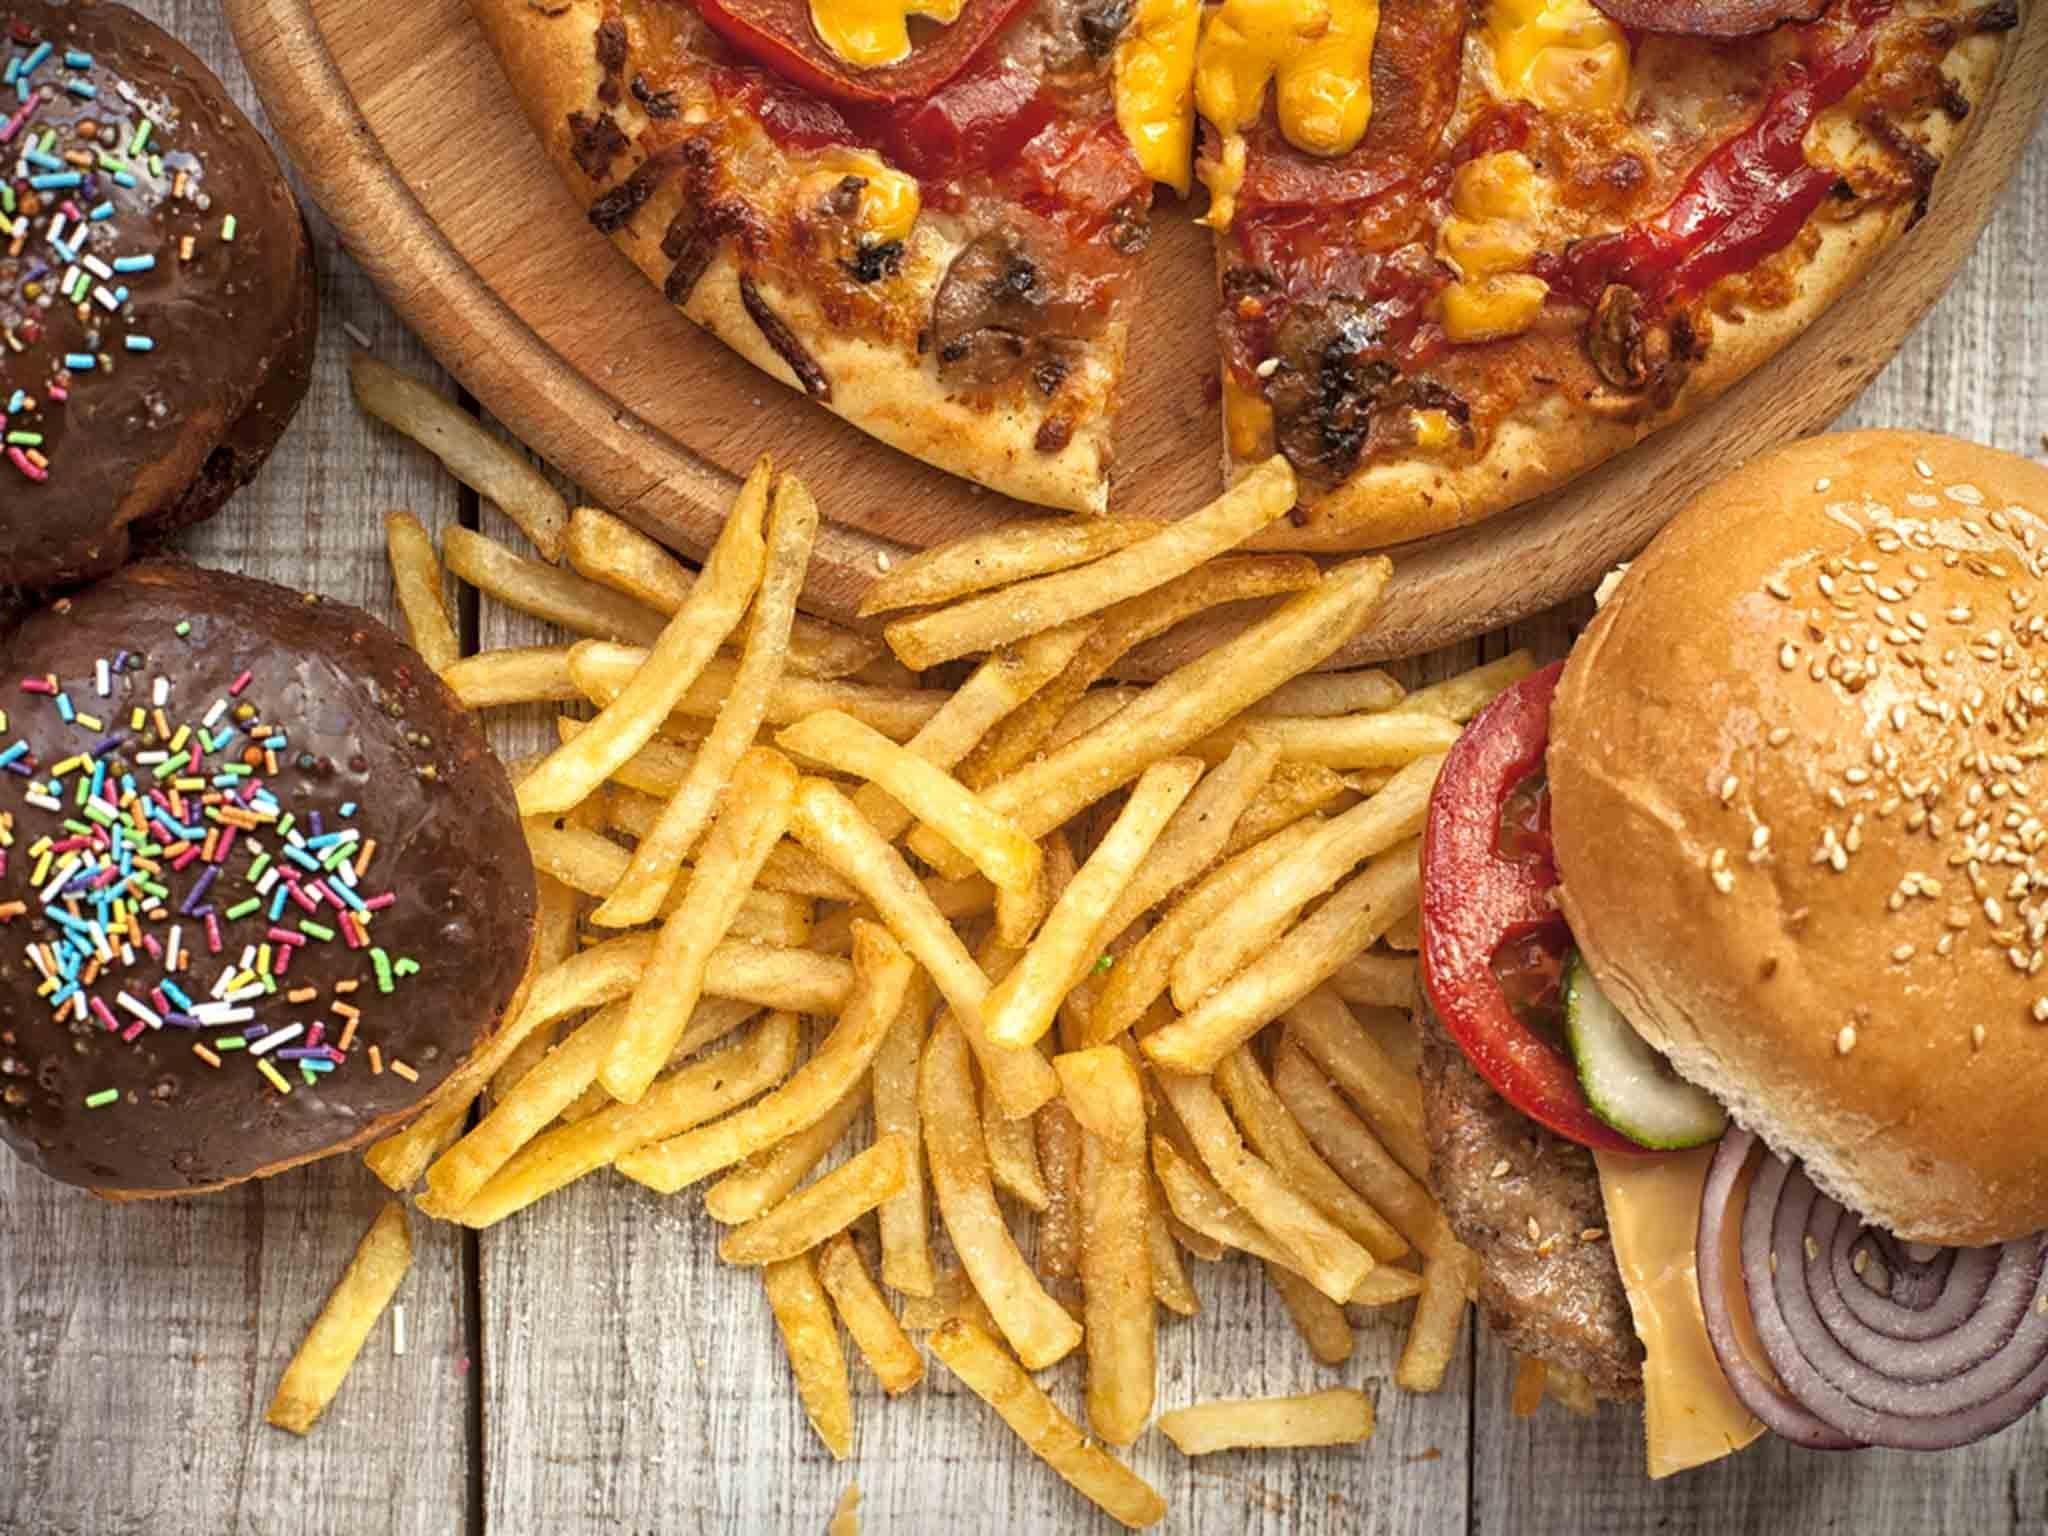 slamme eating fast food - HD2048×1536